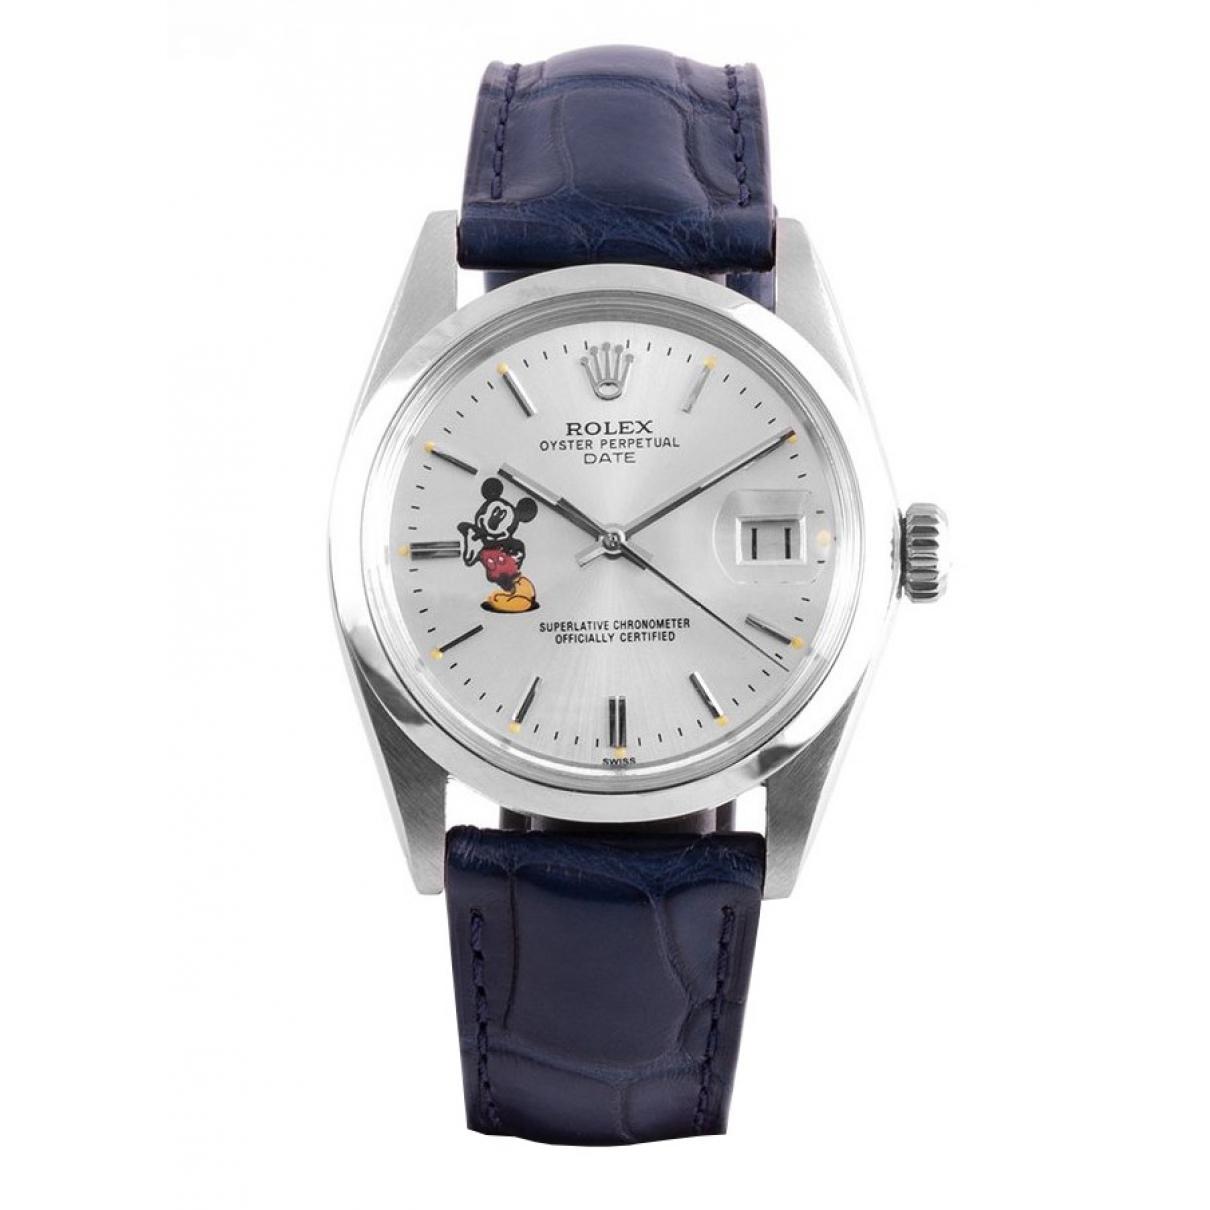 Rolex Oyster Perpetual 34mm Green Steel watch for Women 35.5 EU